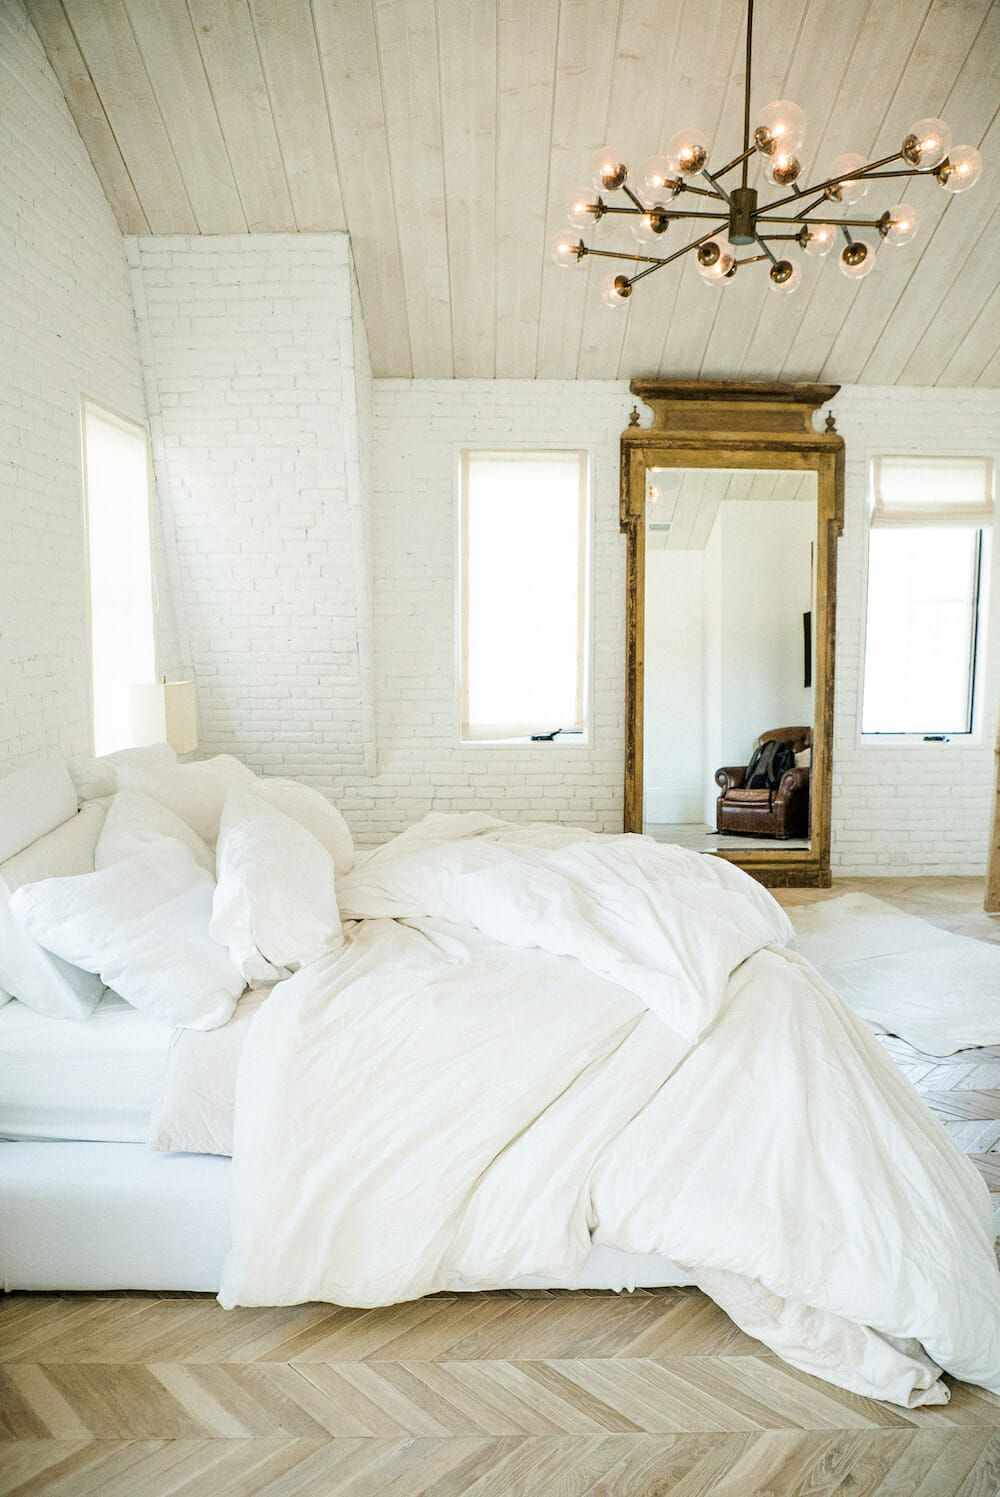 Bedroom ideas Bedroom White Bedroom Ideas House Beautiful 50 Stylish Bedroom Design Ideas Modern Bedrooms Decorating Tips